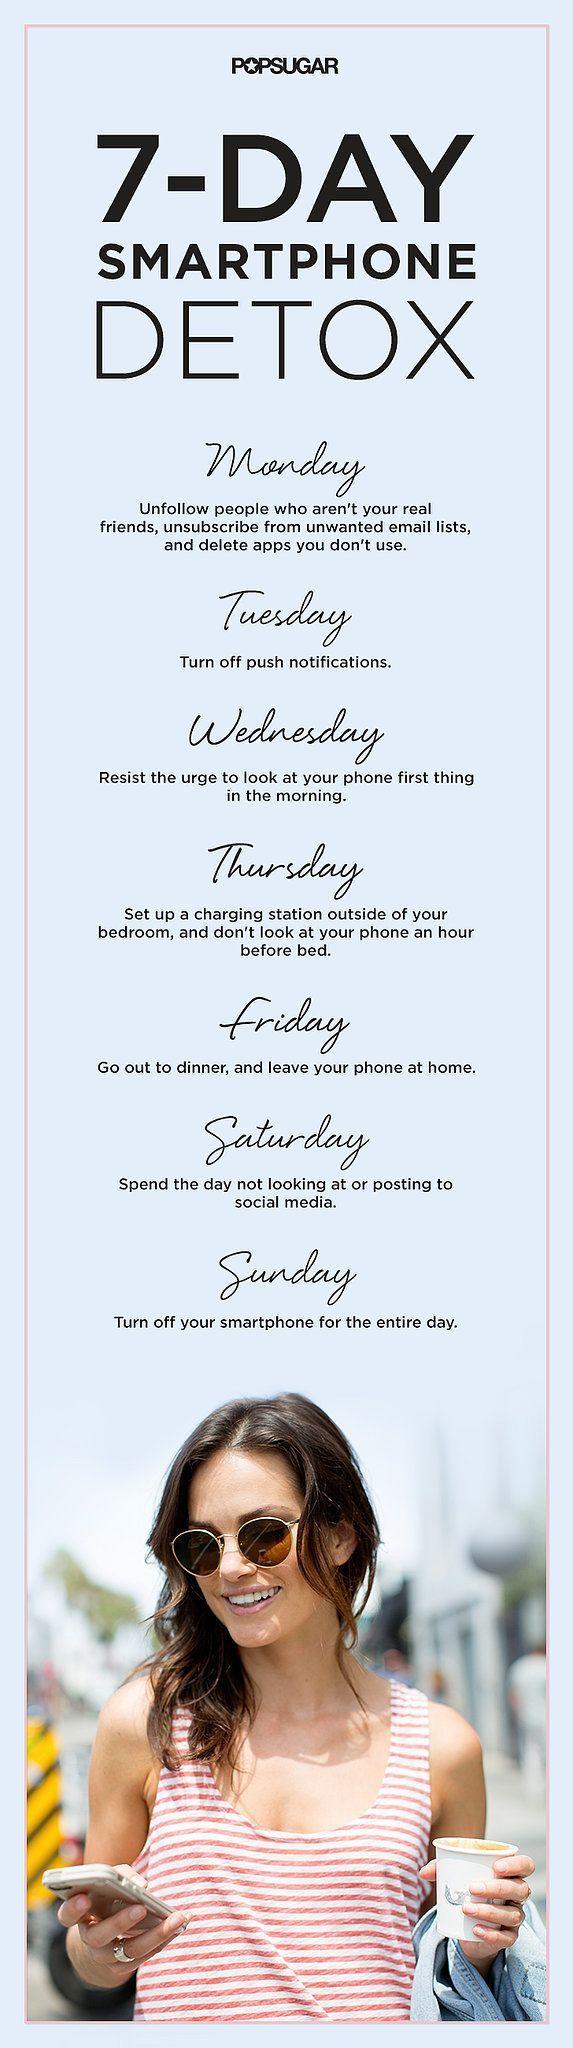 7 Day Smartphone Detox